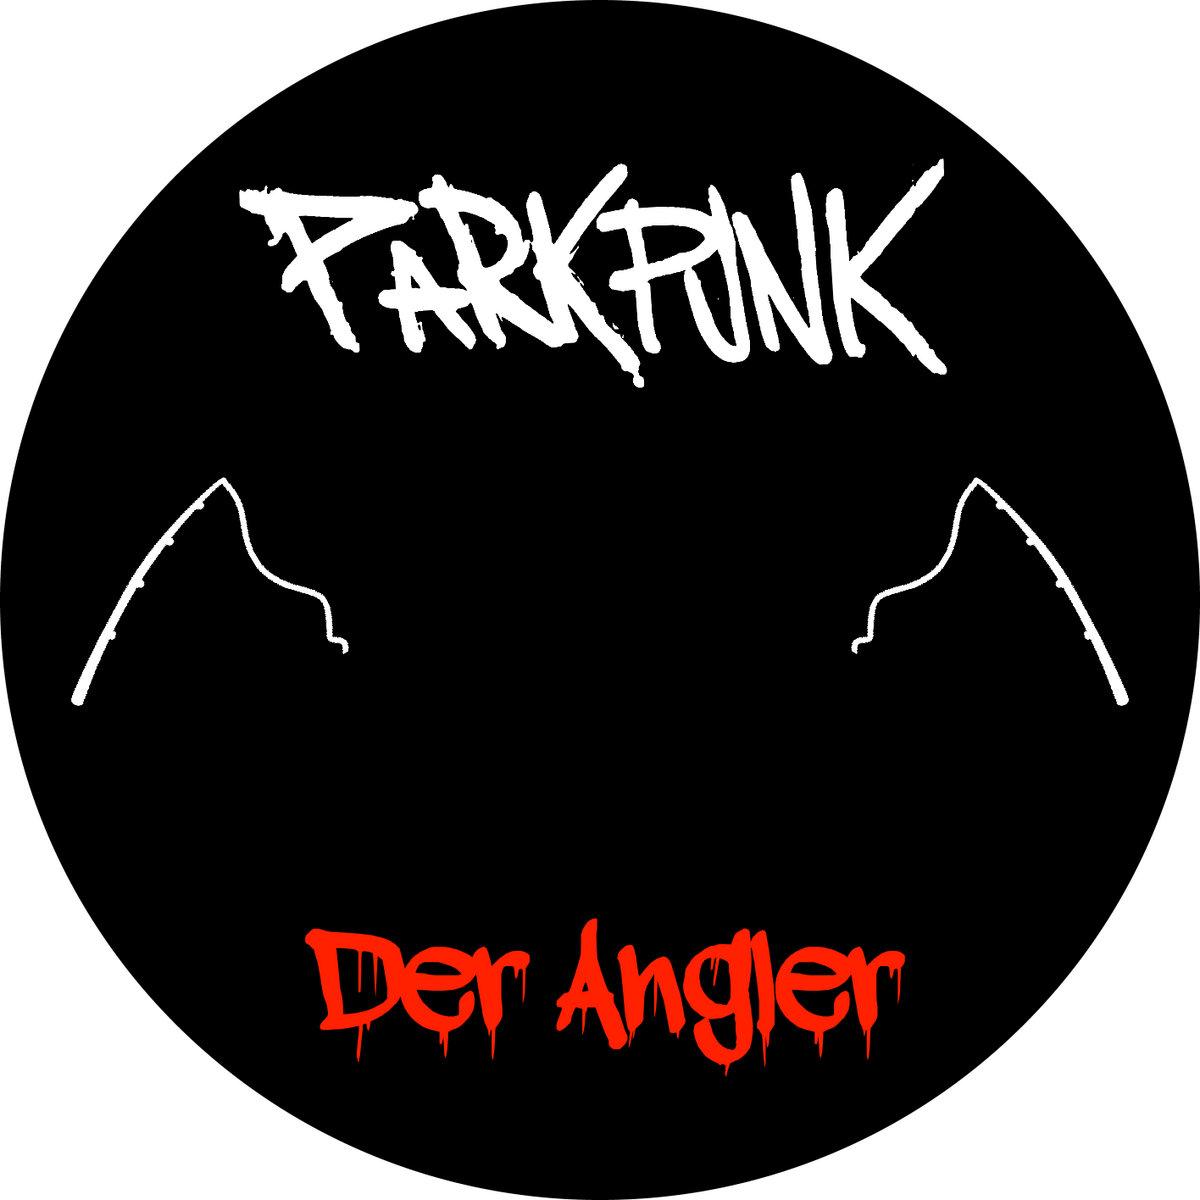 ParkPunk - Der Angler | ParkPunk